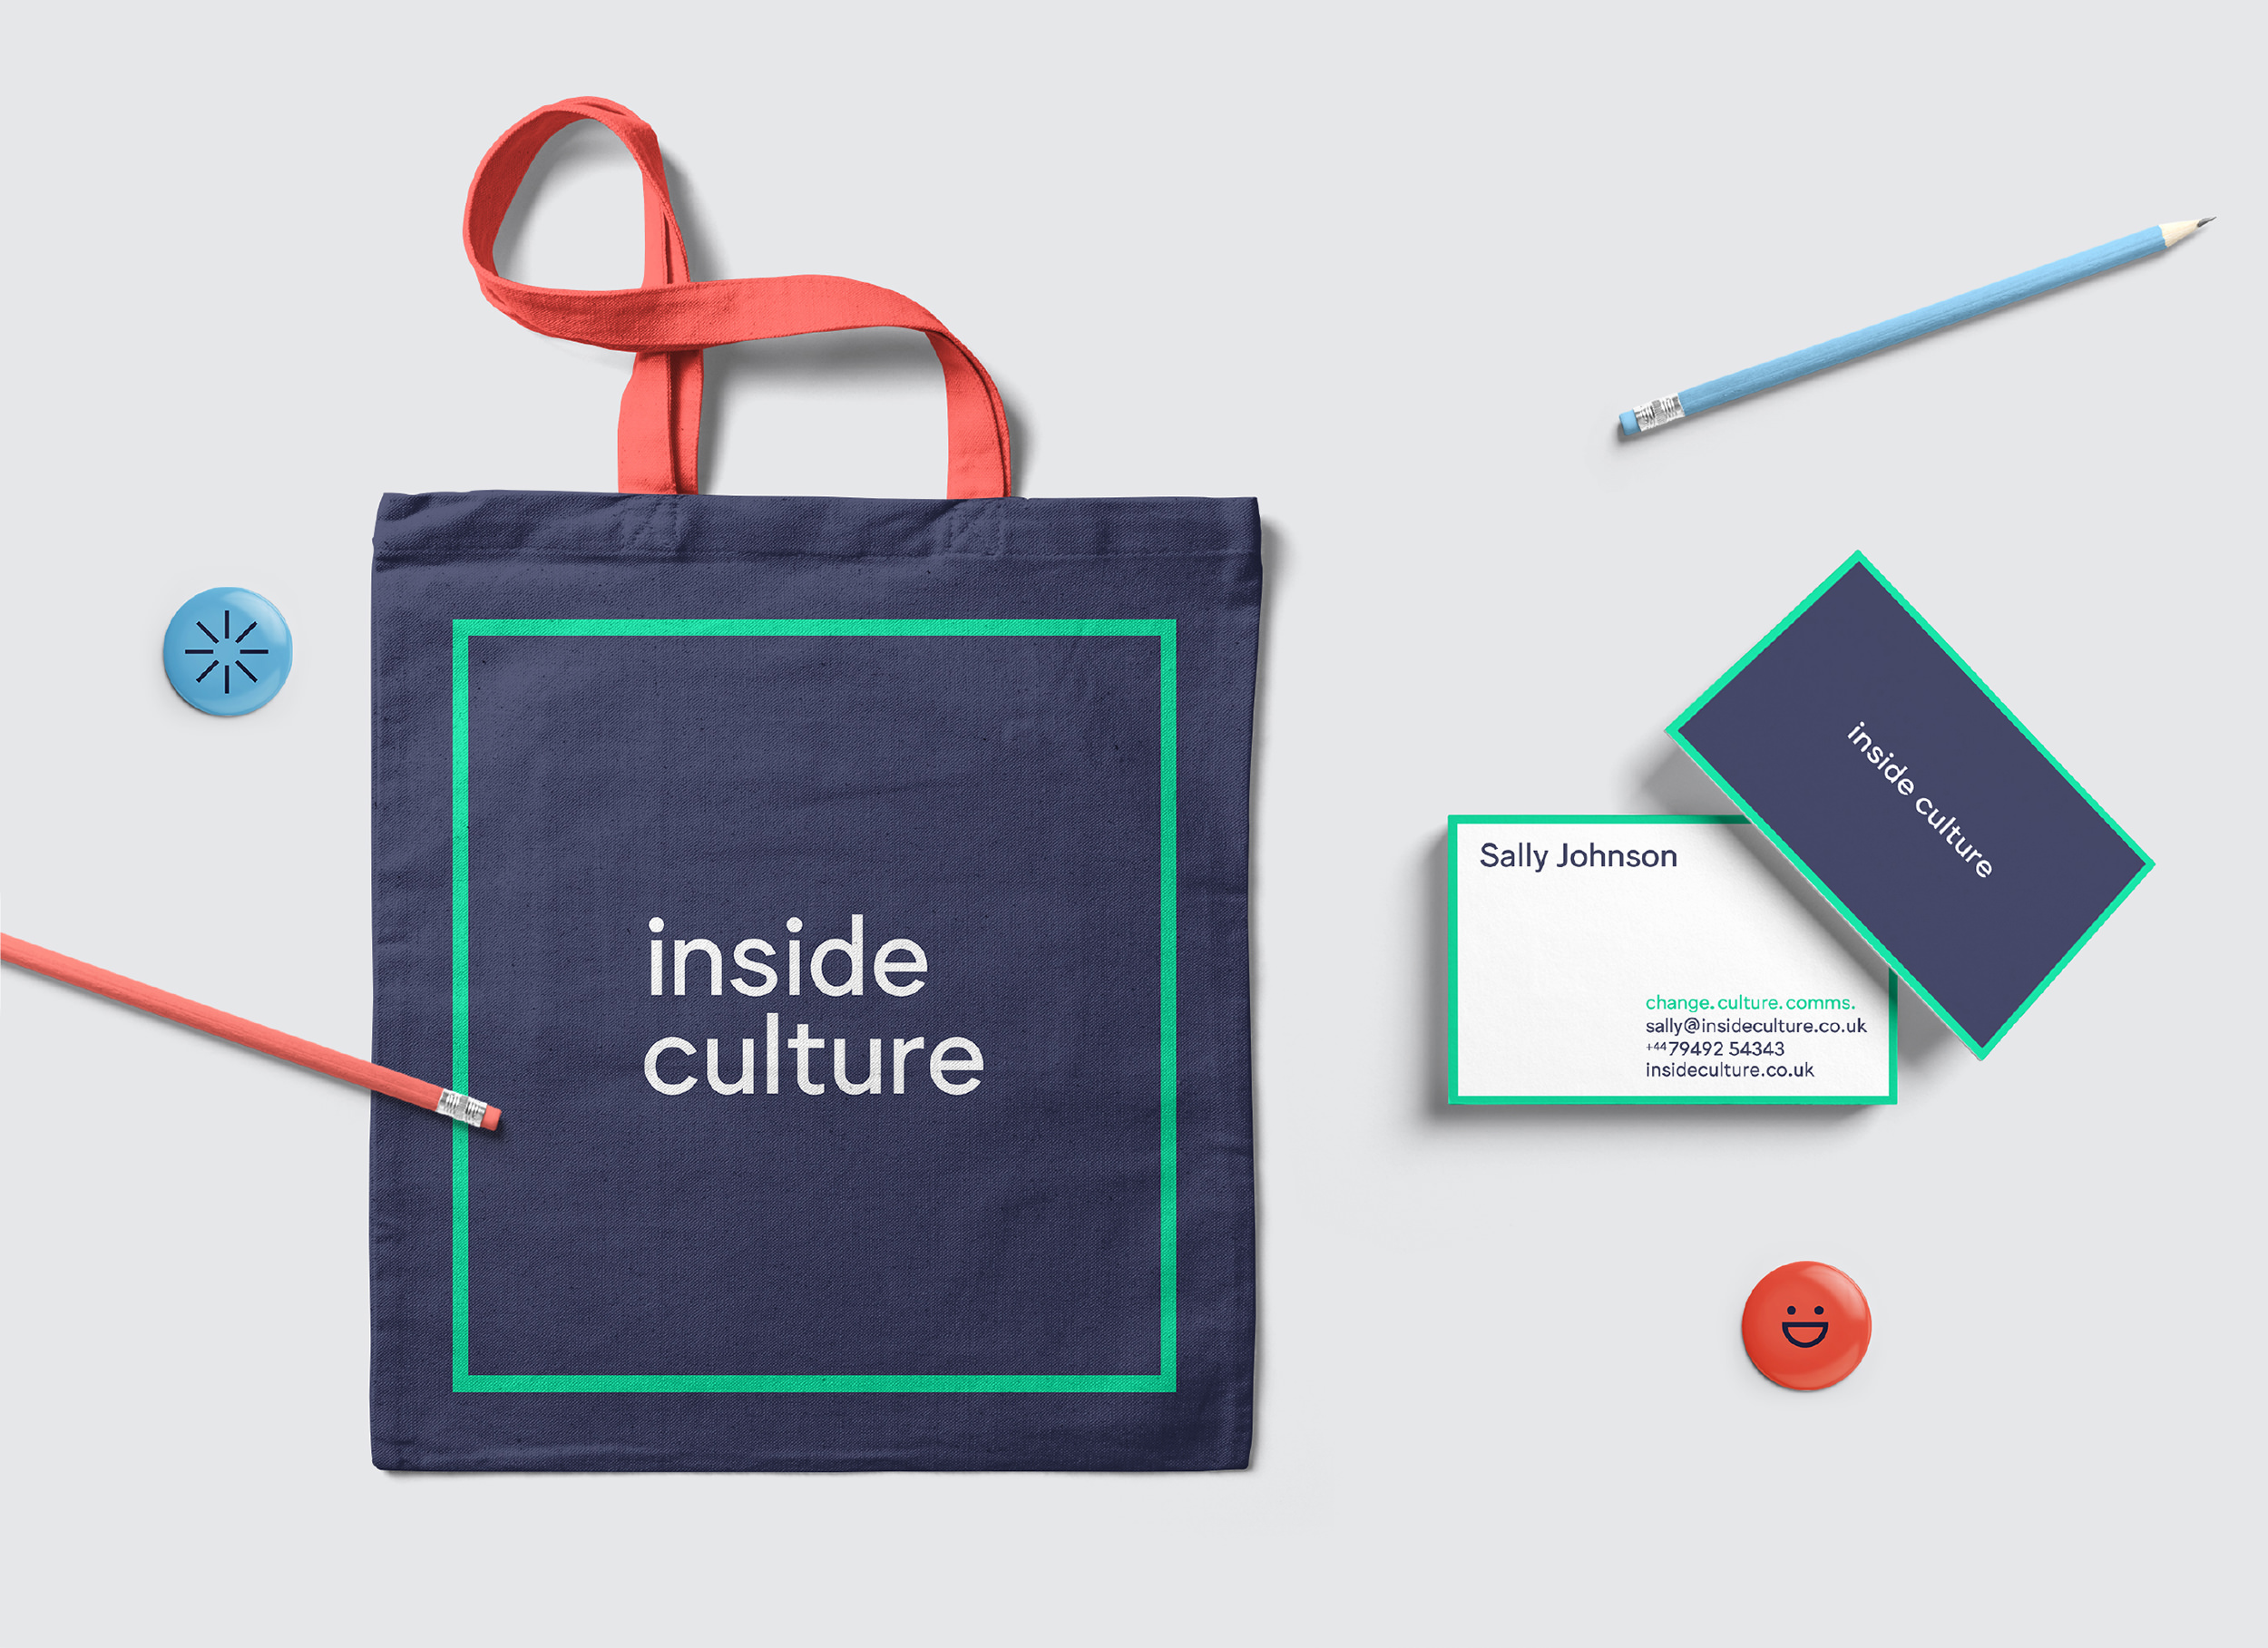 inside-culture-brand-merchandise